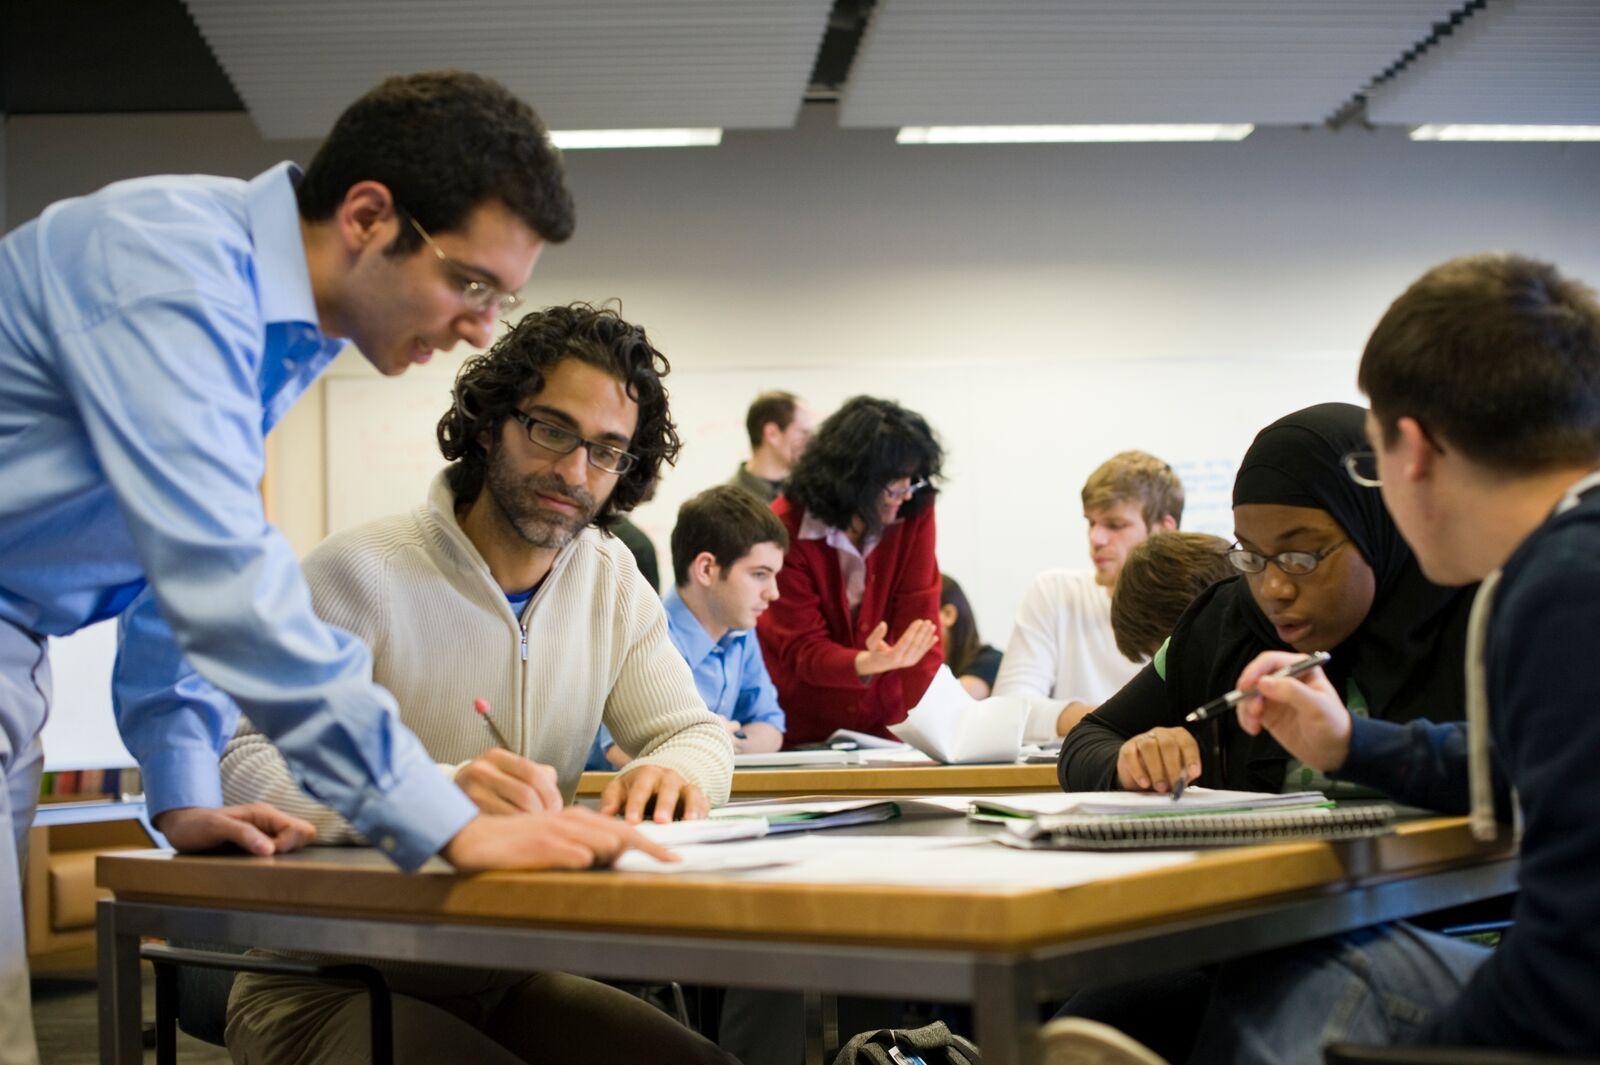 Education | MIT - Massachusetts Institute of Technology